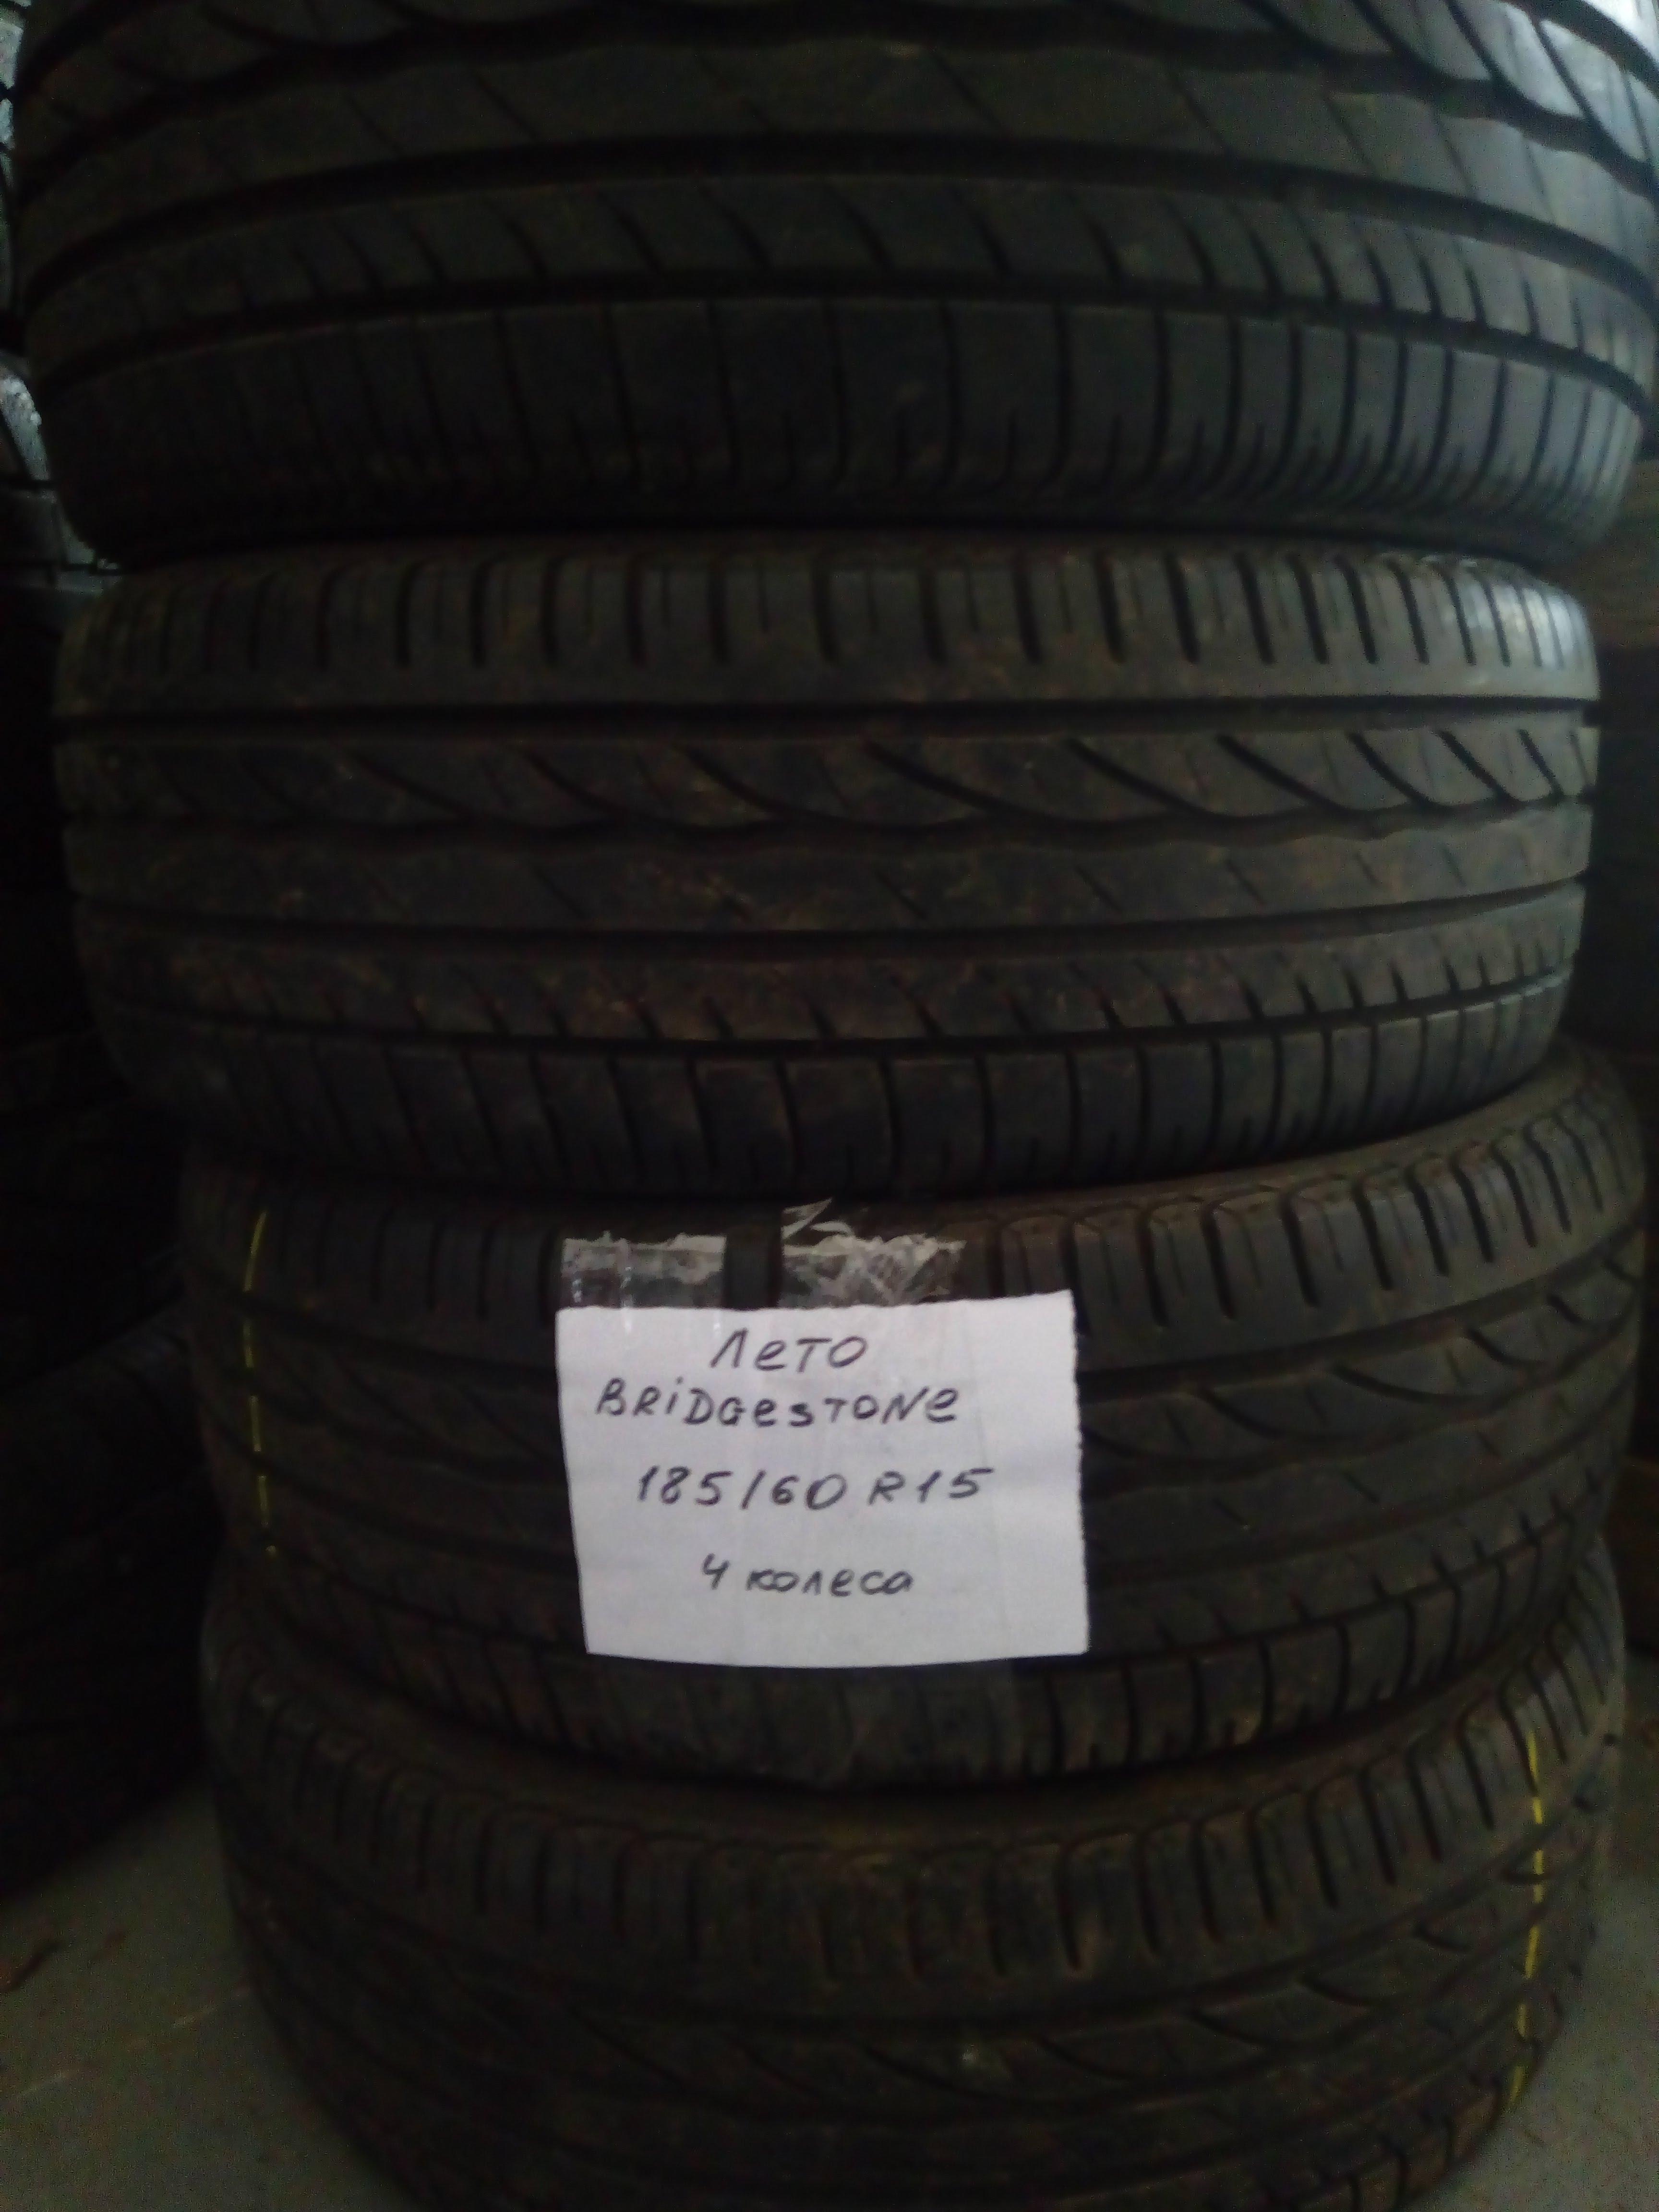 Киев резина бу Bridgestone 185/60 r15 4 шт лето